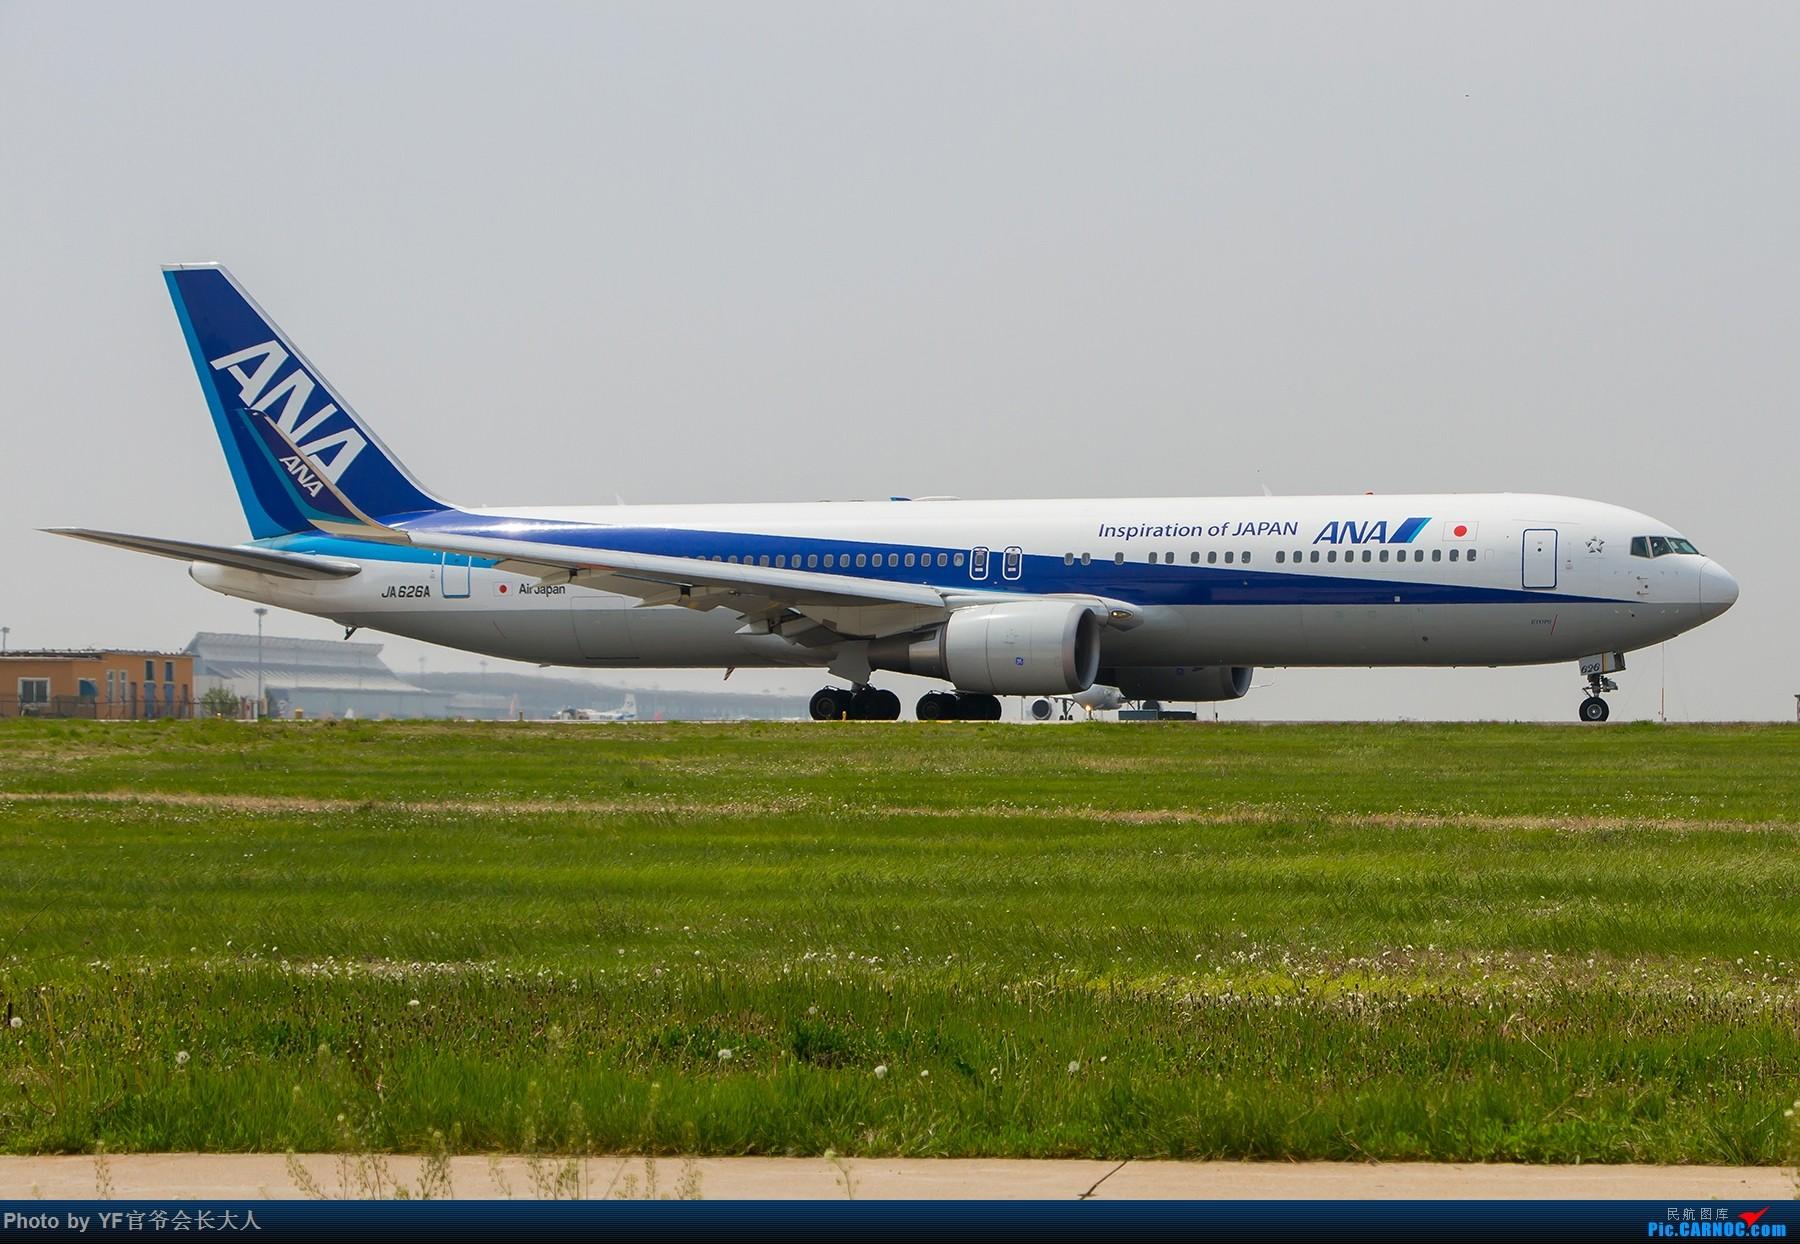 Re:[原创]【ZYTX】轻易不拍机,拍就要拍个过瘾!(新开的酷鸟,亚洲大西洋,顺带碰上朝韩两国的好货) BOEING 767-300ER JA626A 中国沈阳桃仙国际机场